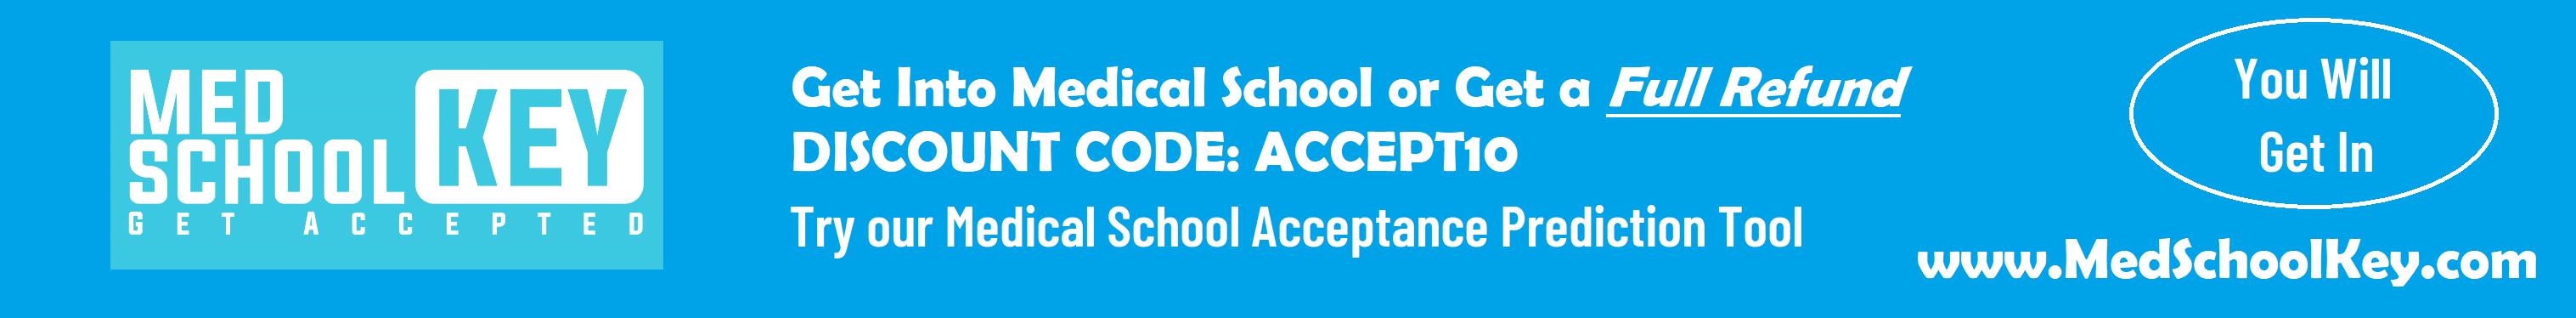 Go to www.MedSchoolKey.com to get into med school